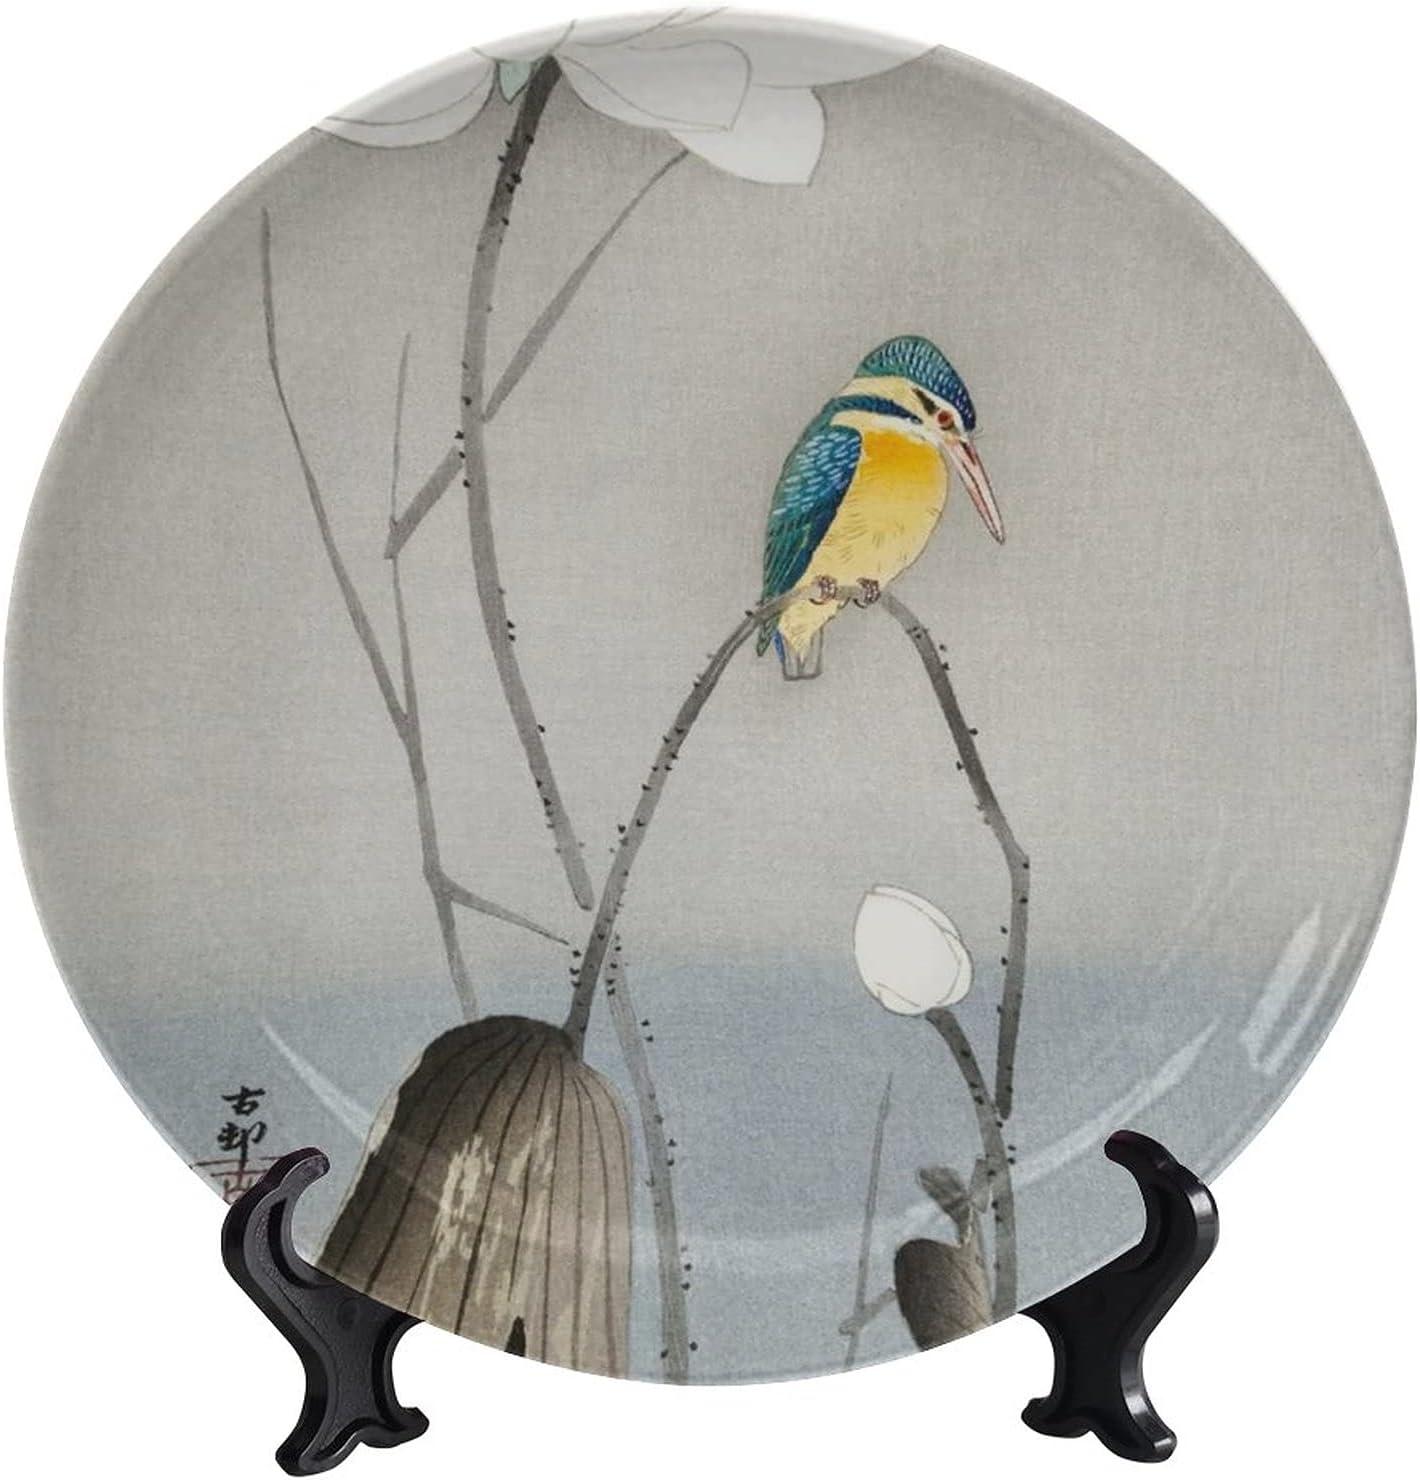 wonderr Kingfisher on Lotus Flower Direct stock discount Ja Decorative Plates Max 44% OFF Ceramic